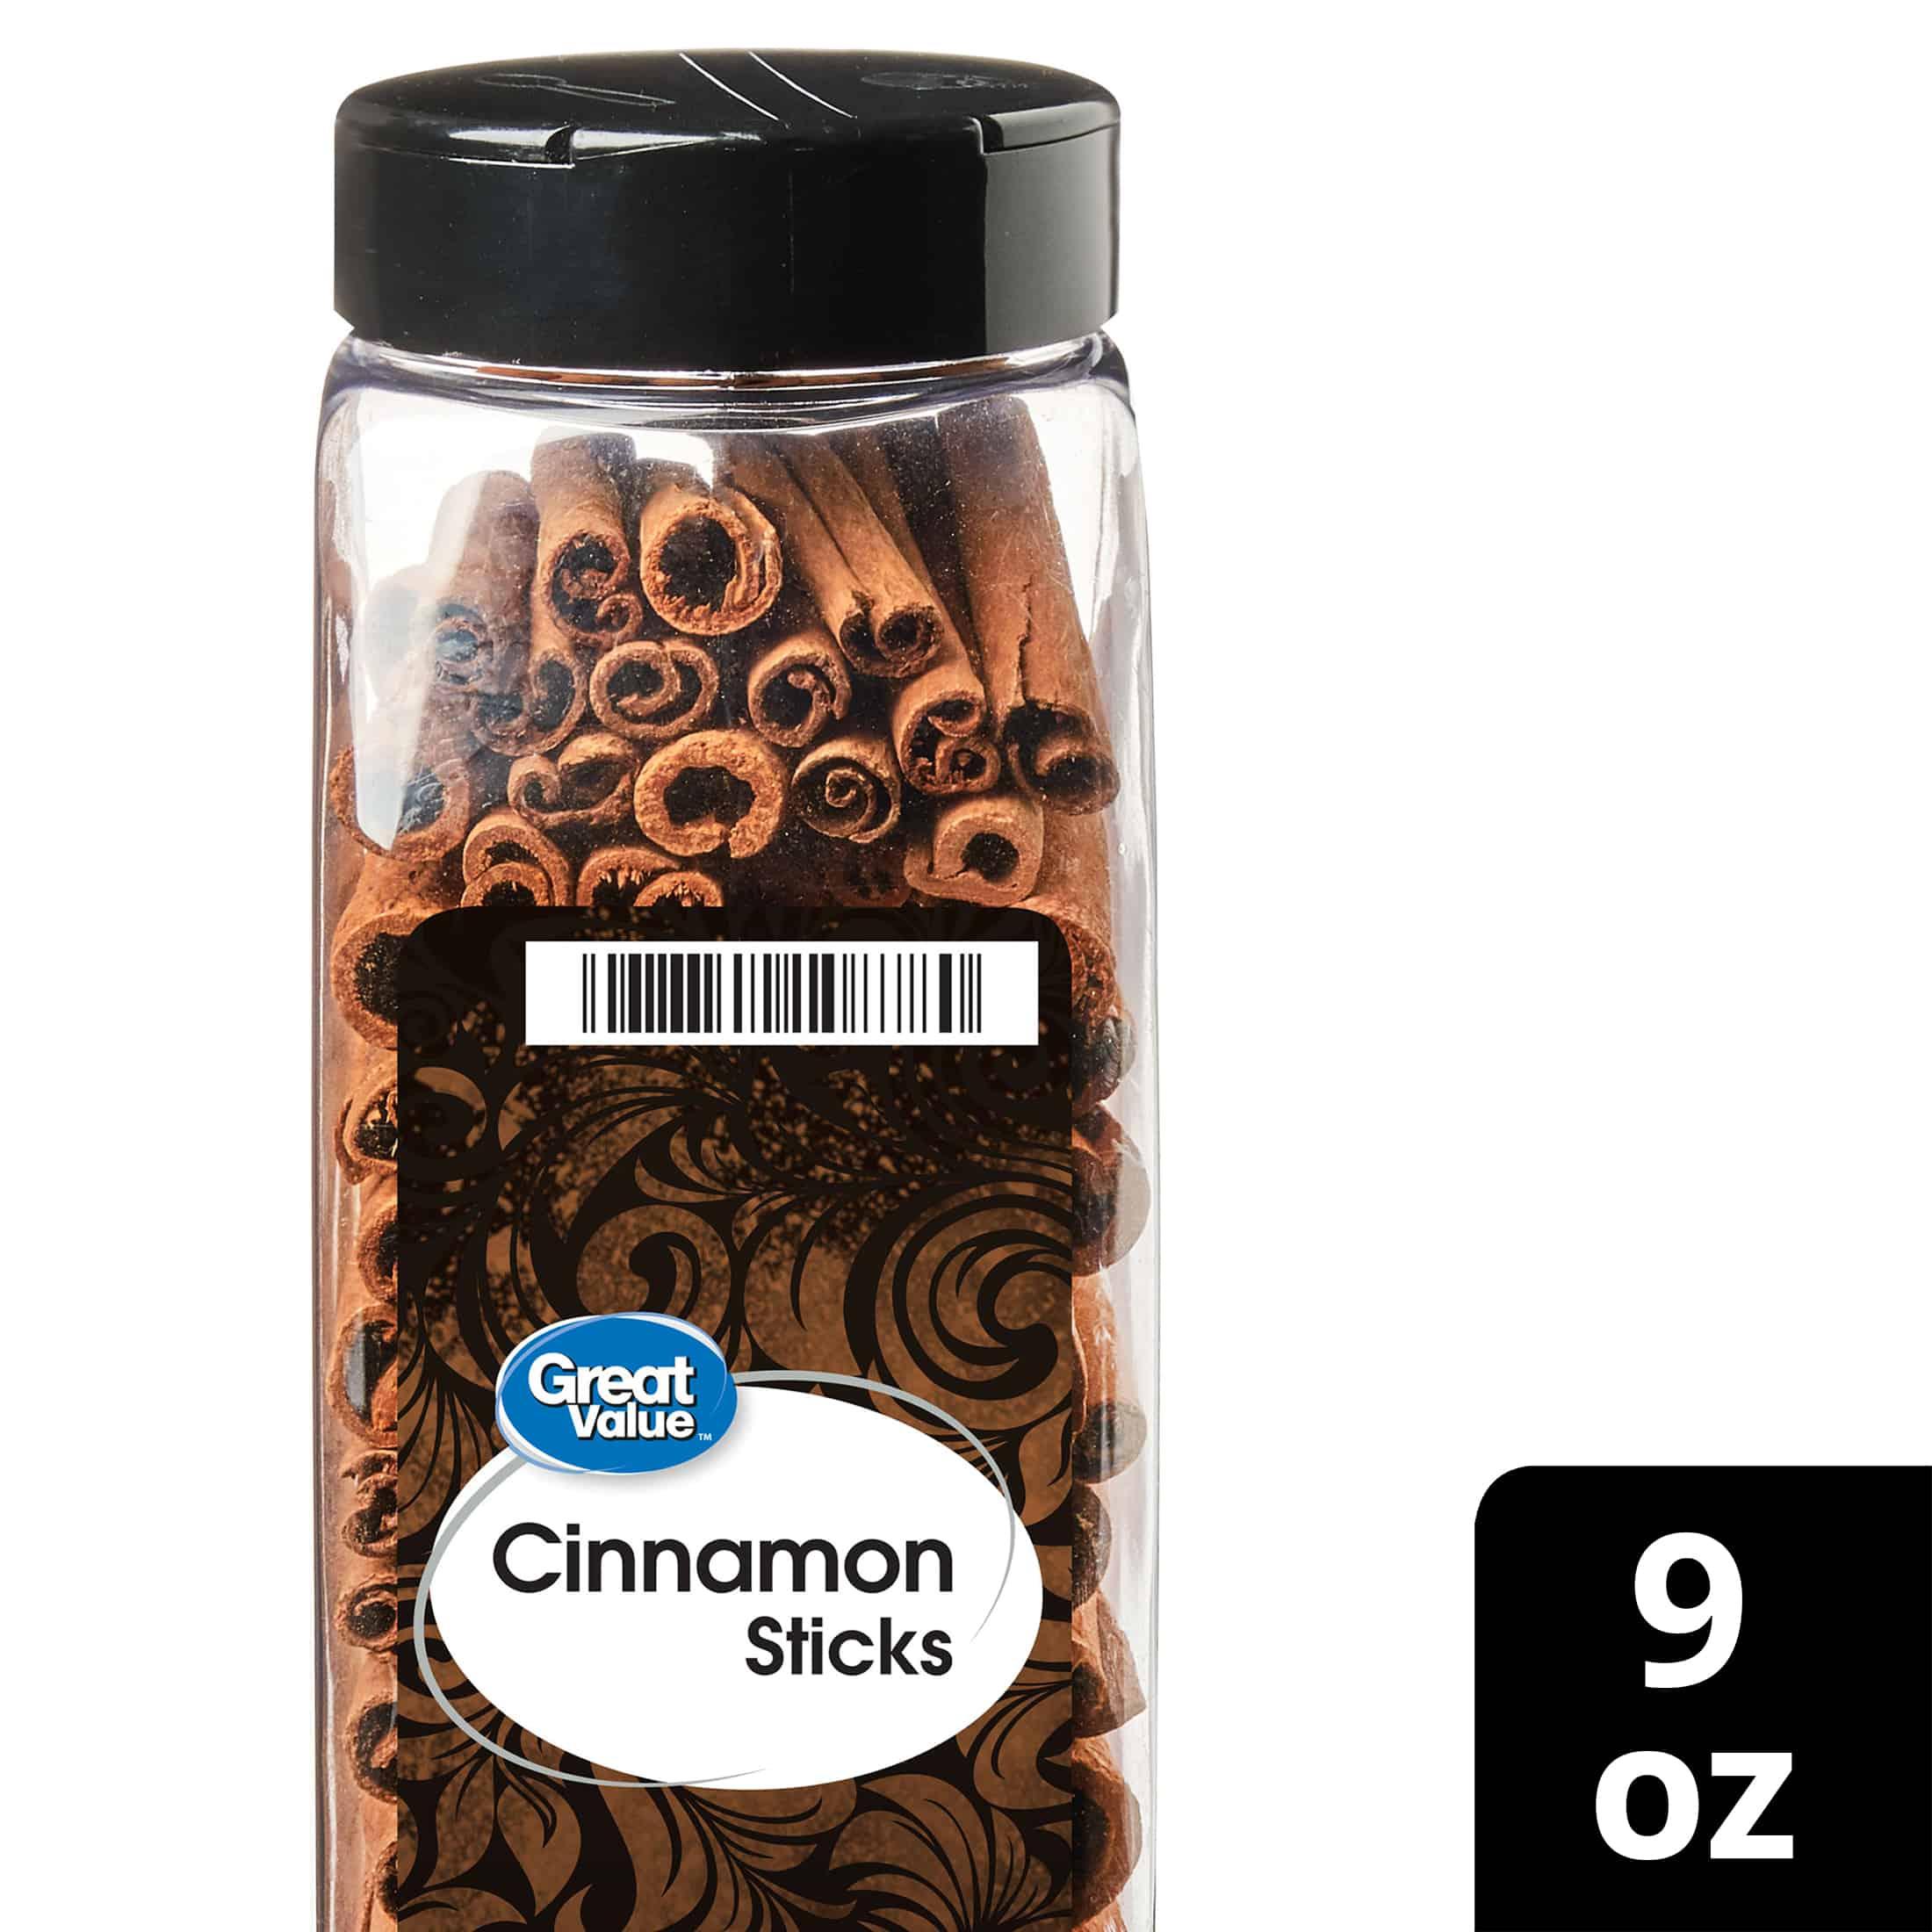 Great Value Cinnamon Sticks